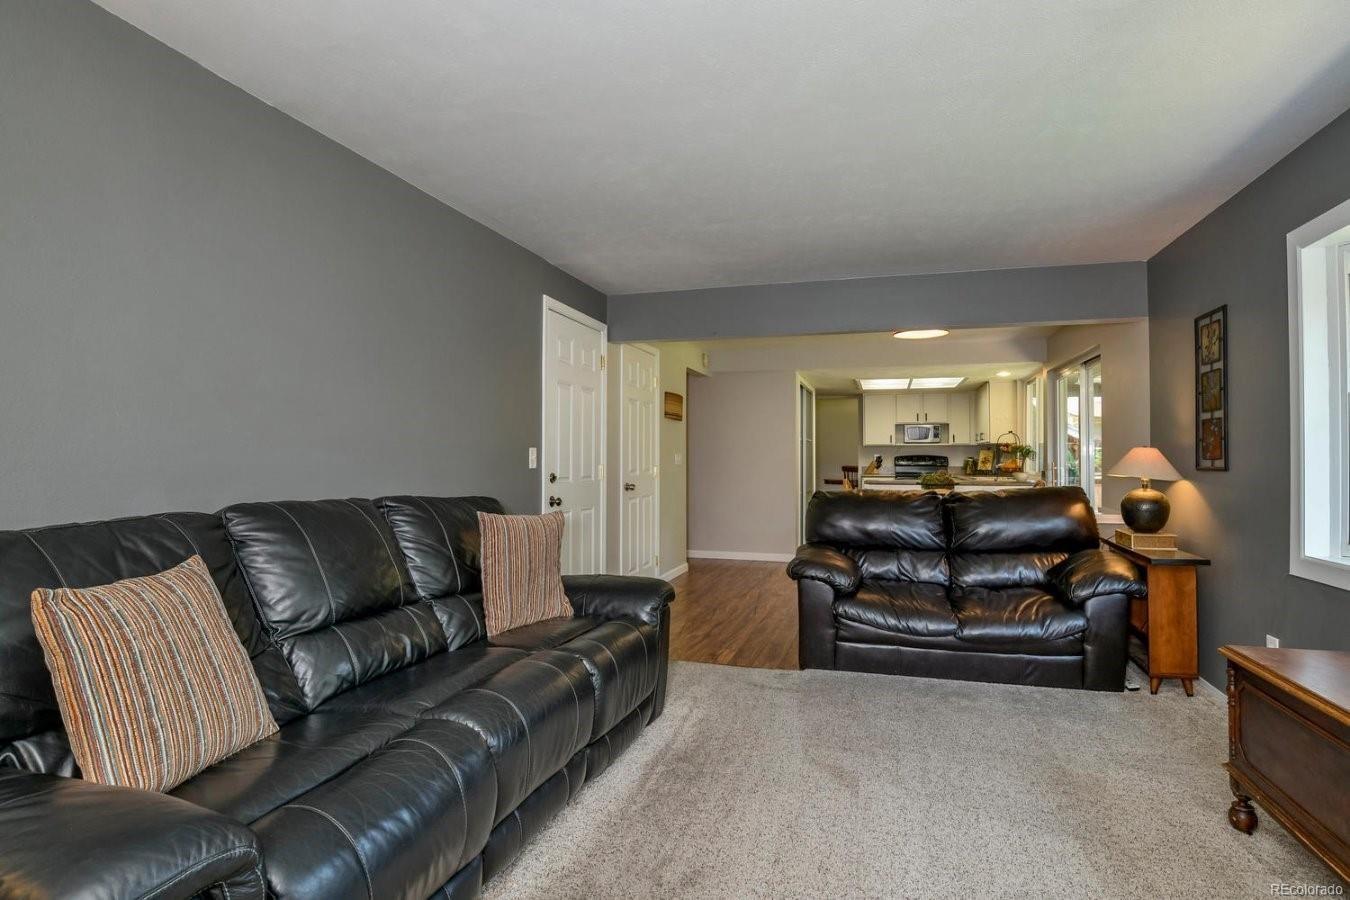 MLS# 5761637 - 1 - 4068  S Wisteria Way, Denver, CO 80237